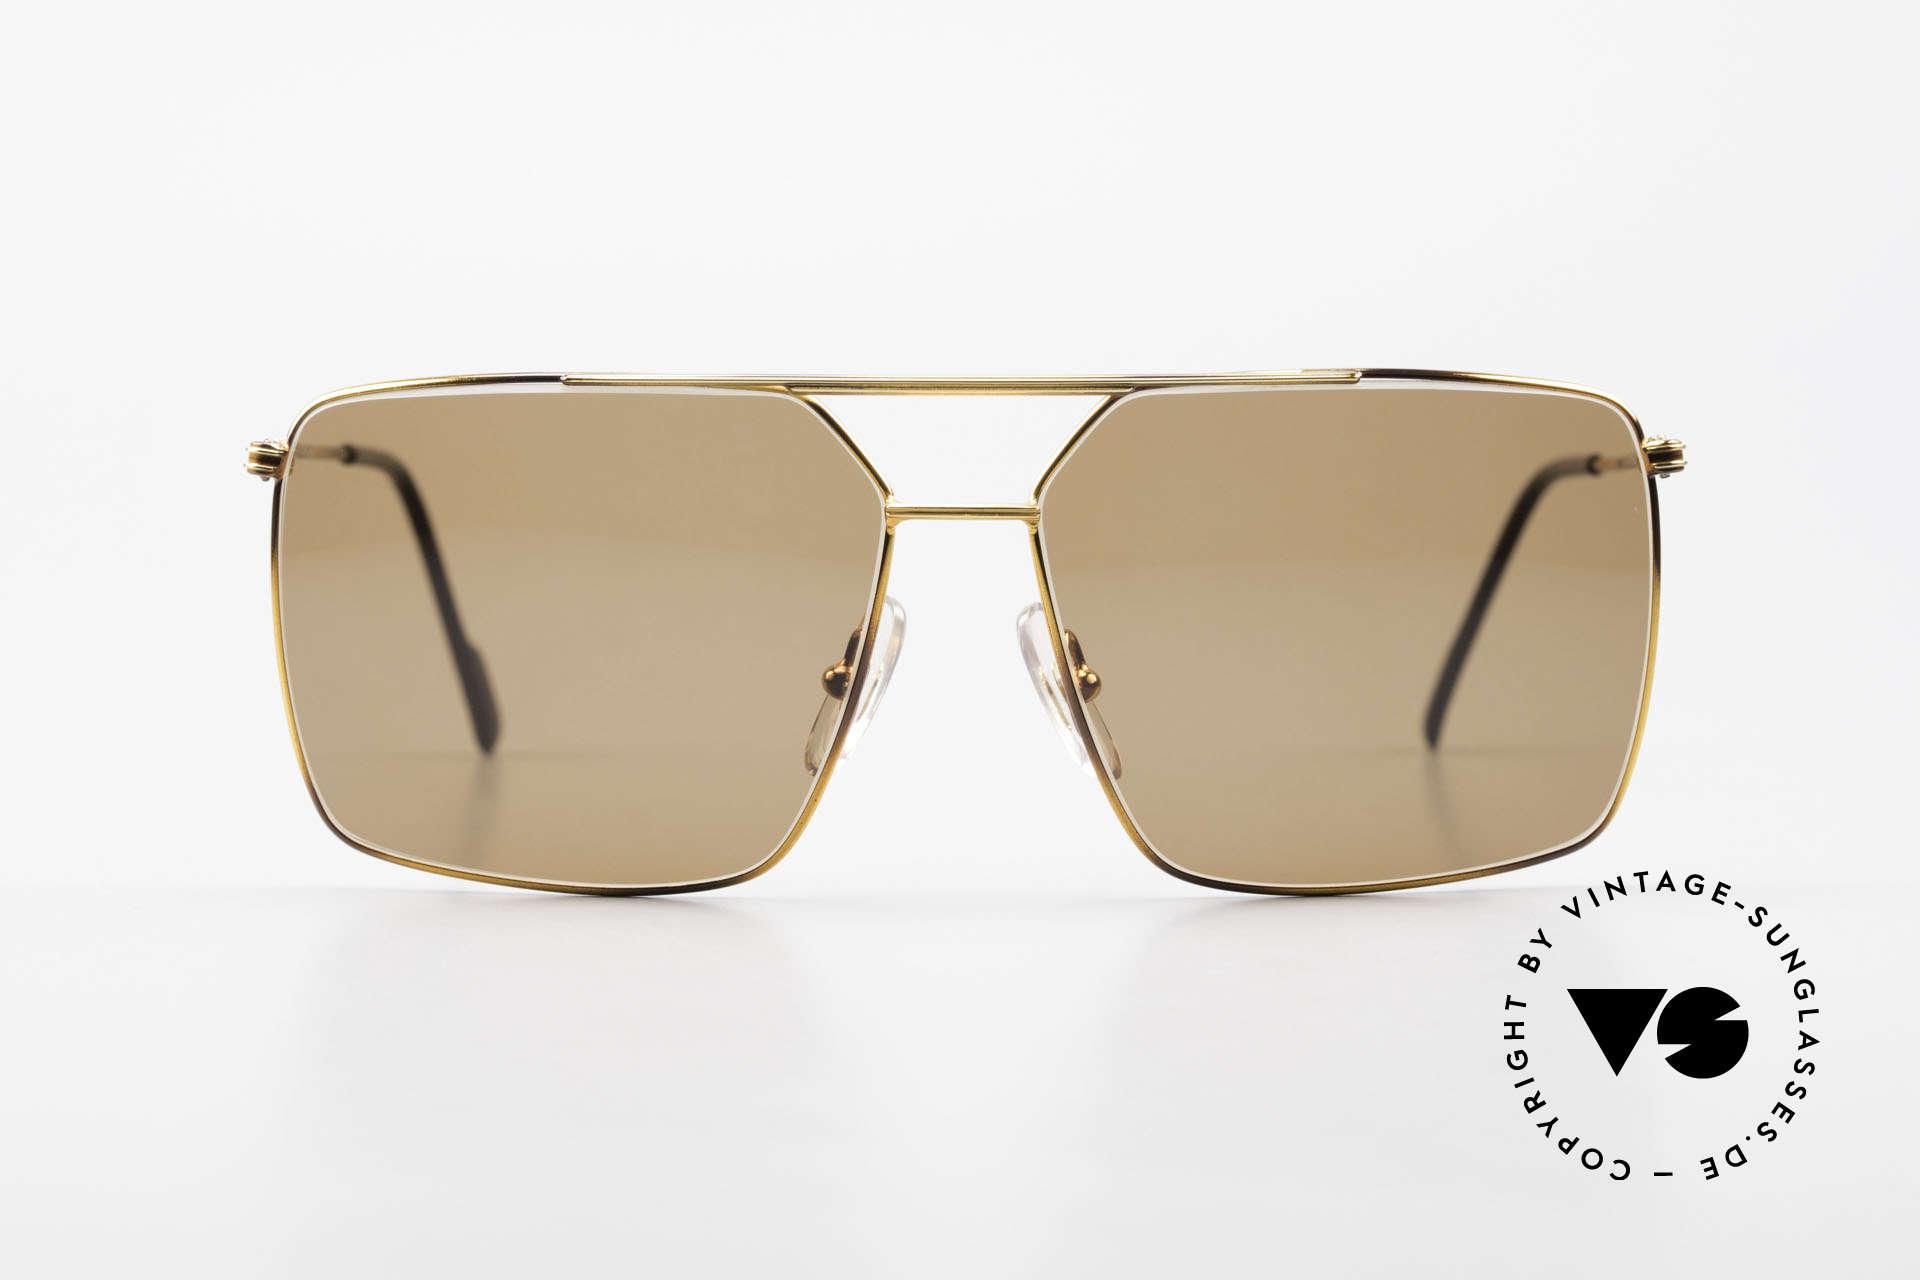 Ferrari F46 Retro Sunglasses True Vintage, lightweight frame; F46, col. 65G, size 59-13, 140, Made for Men